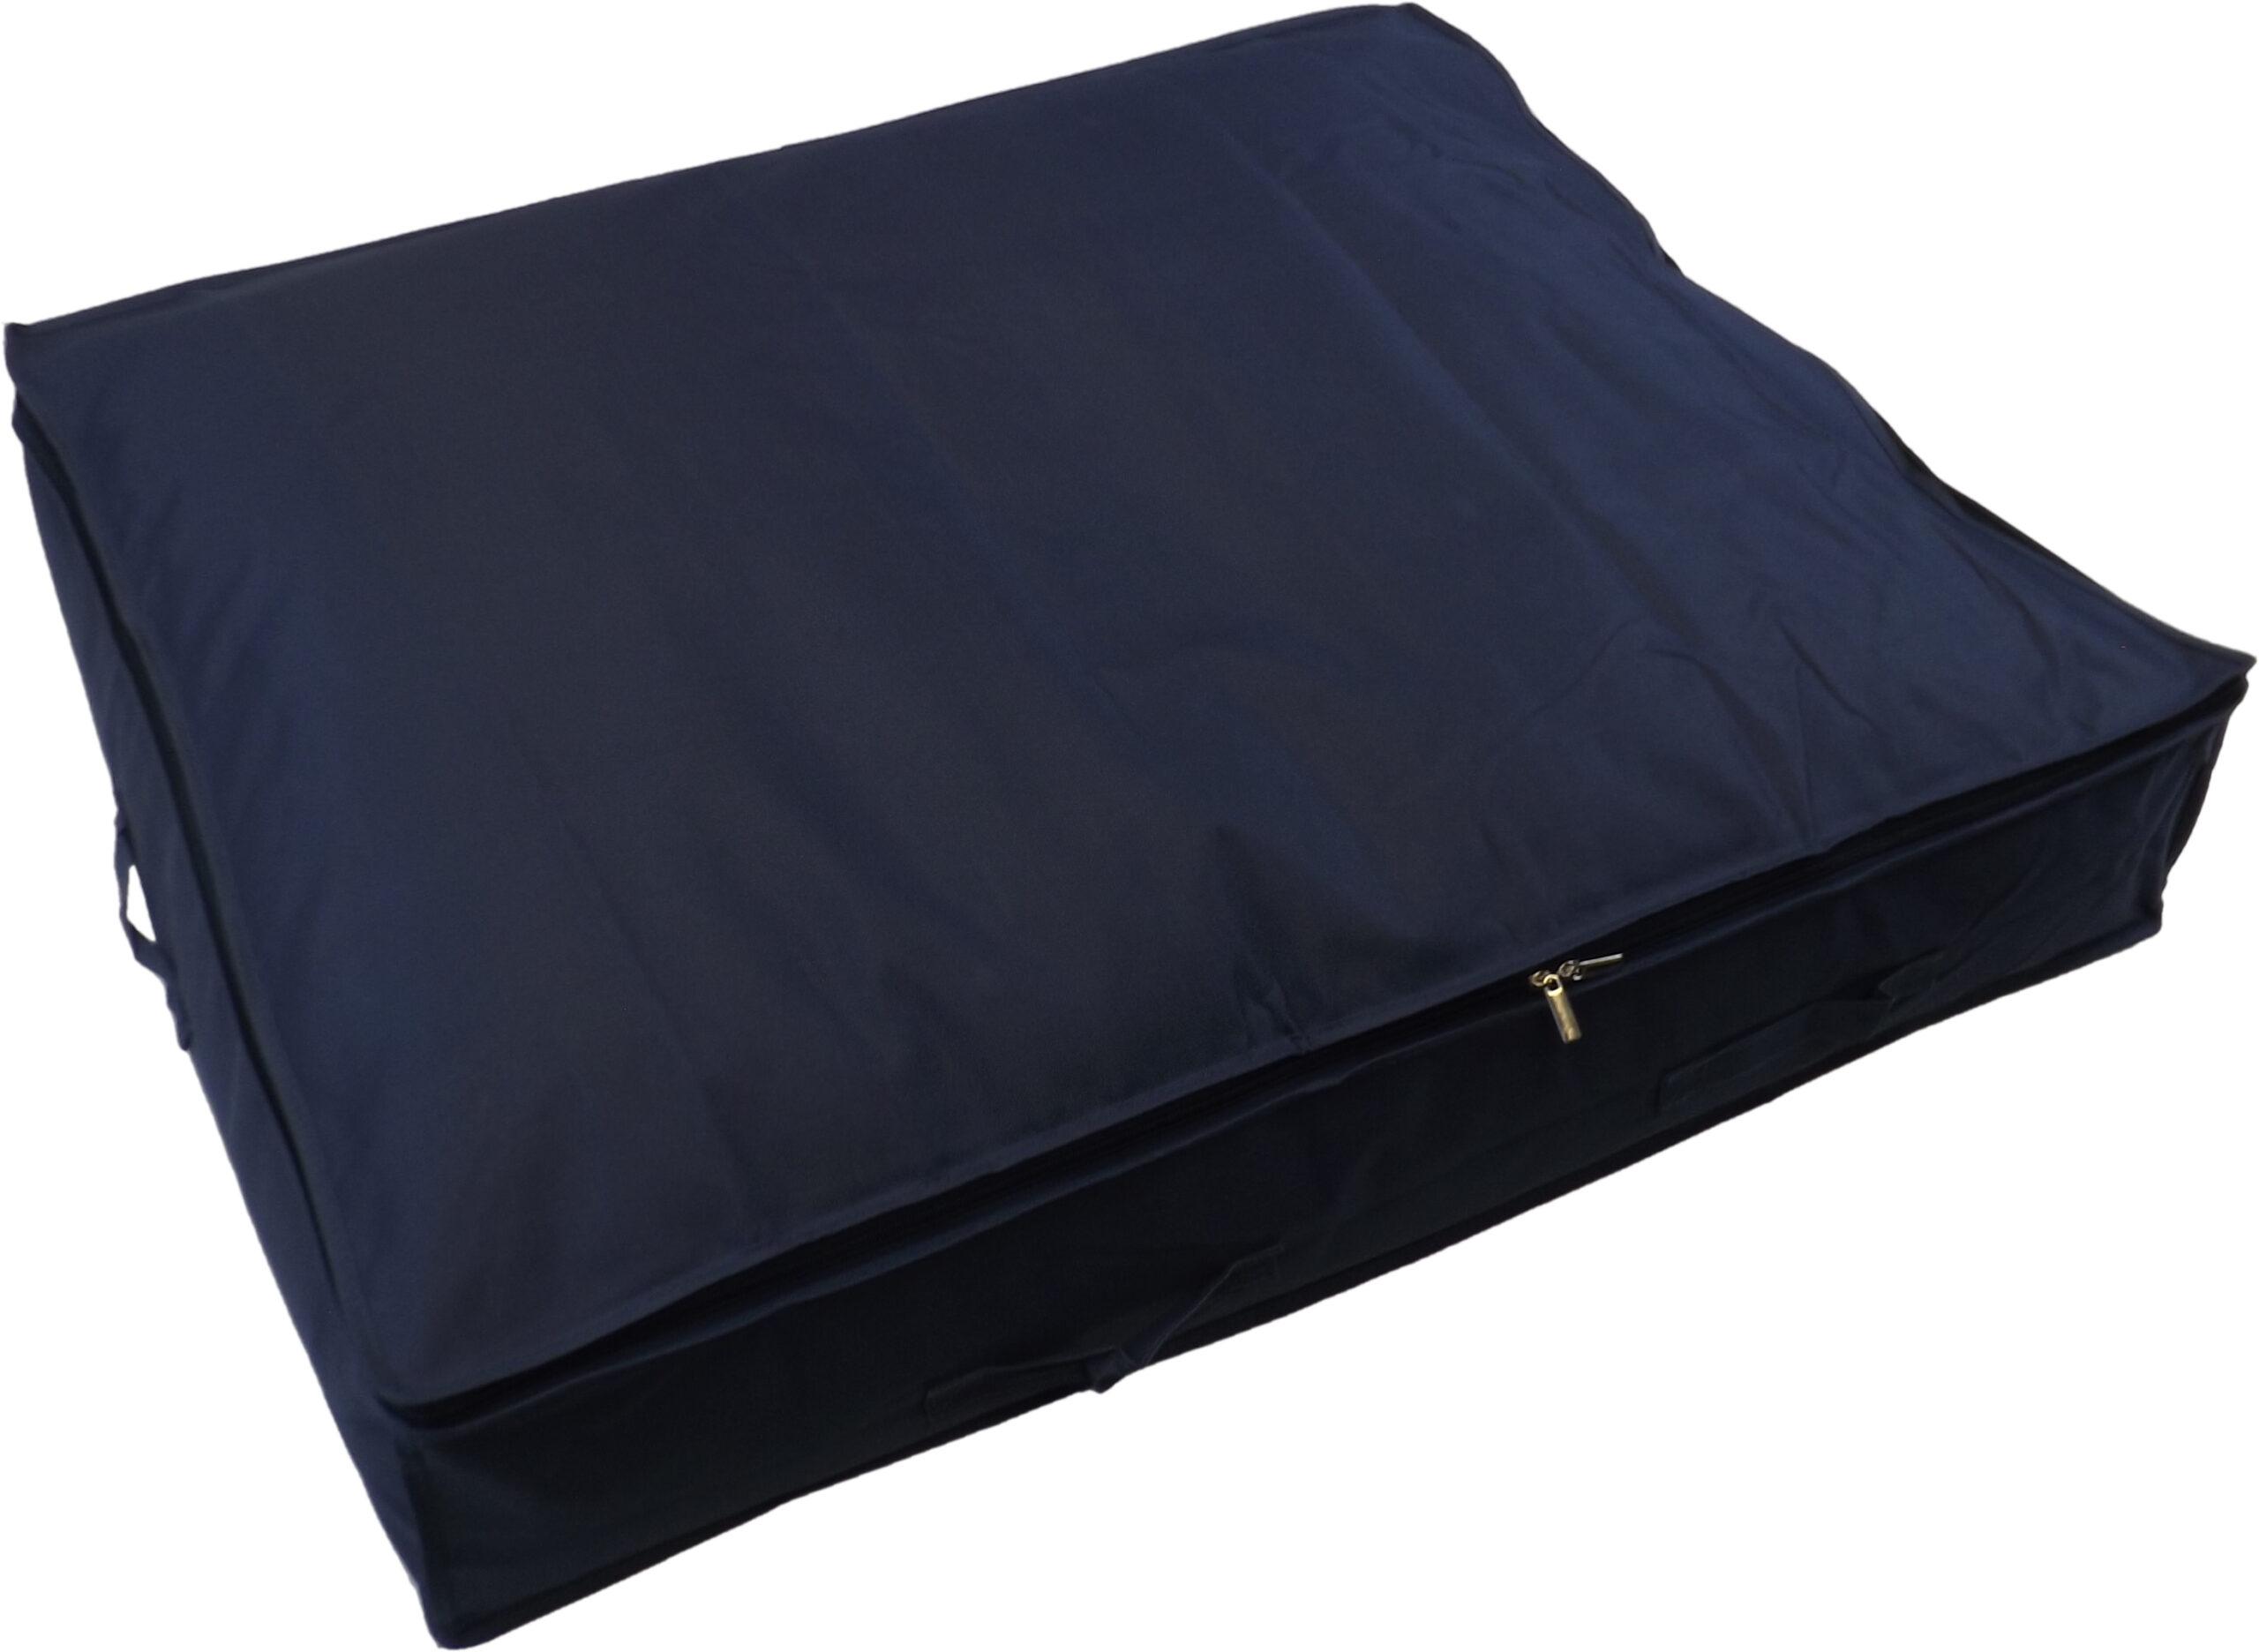 Extra Large Underbed Storage Bag, Heavy Duty, 130 Litre Capacity, 96x78x18cm, Blue